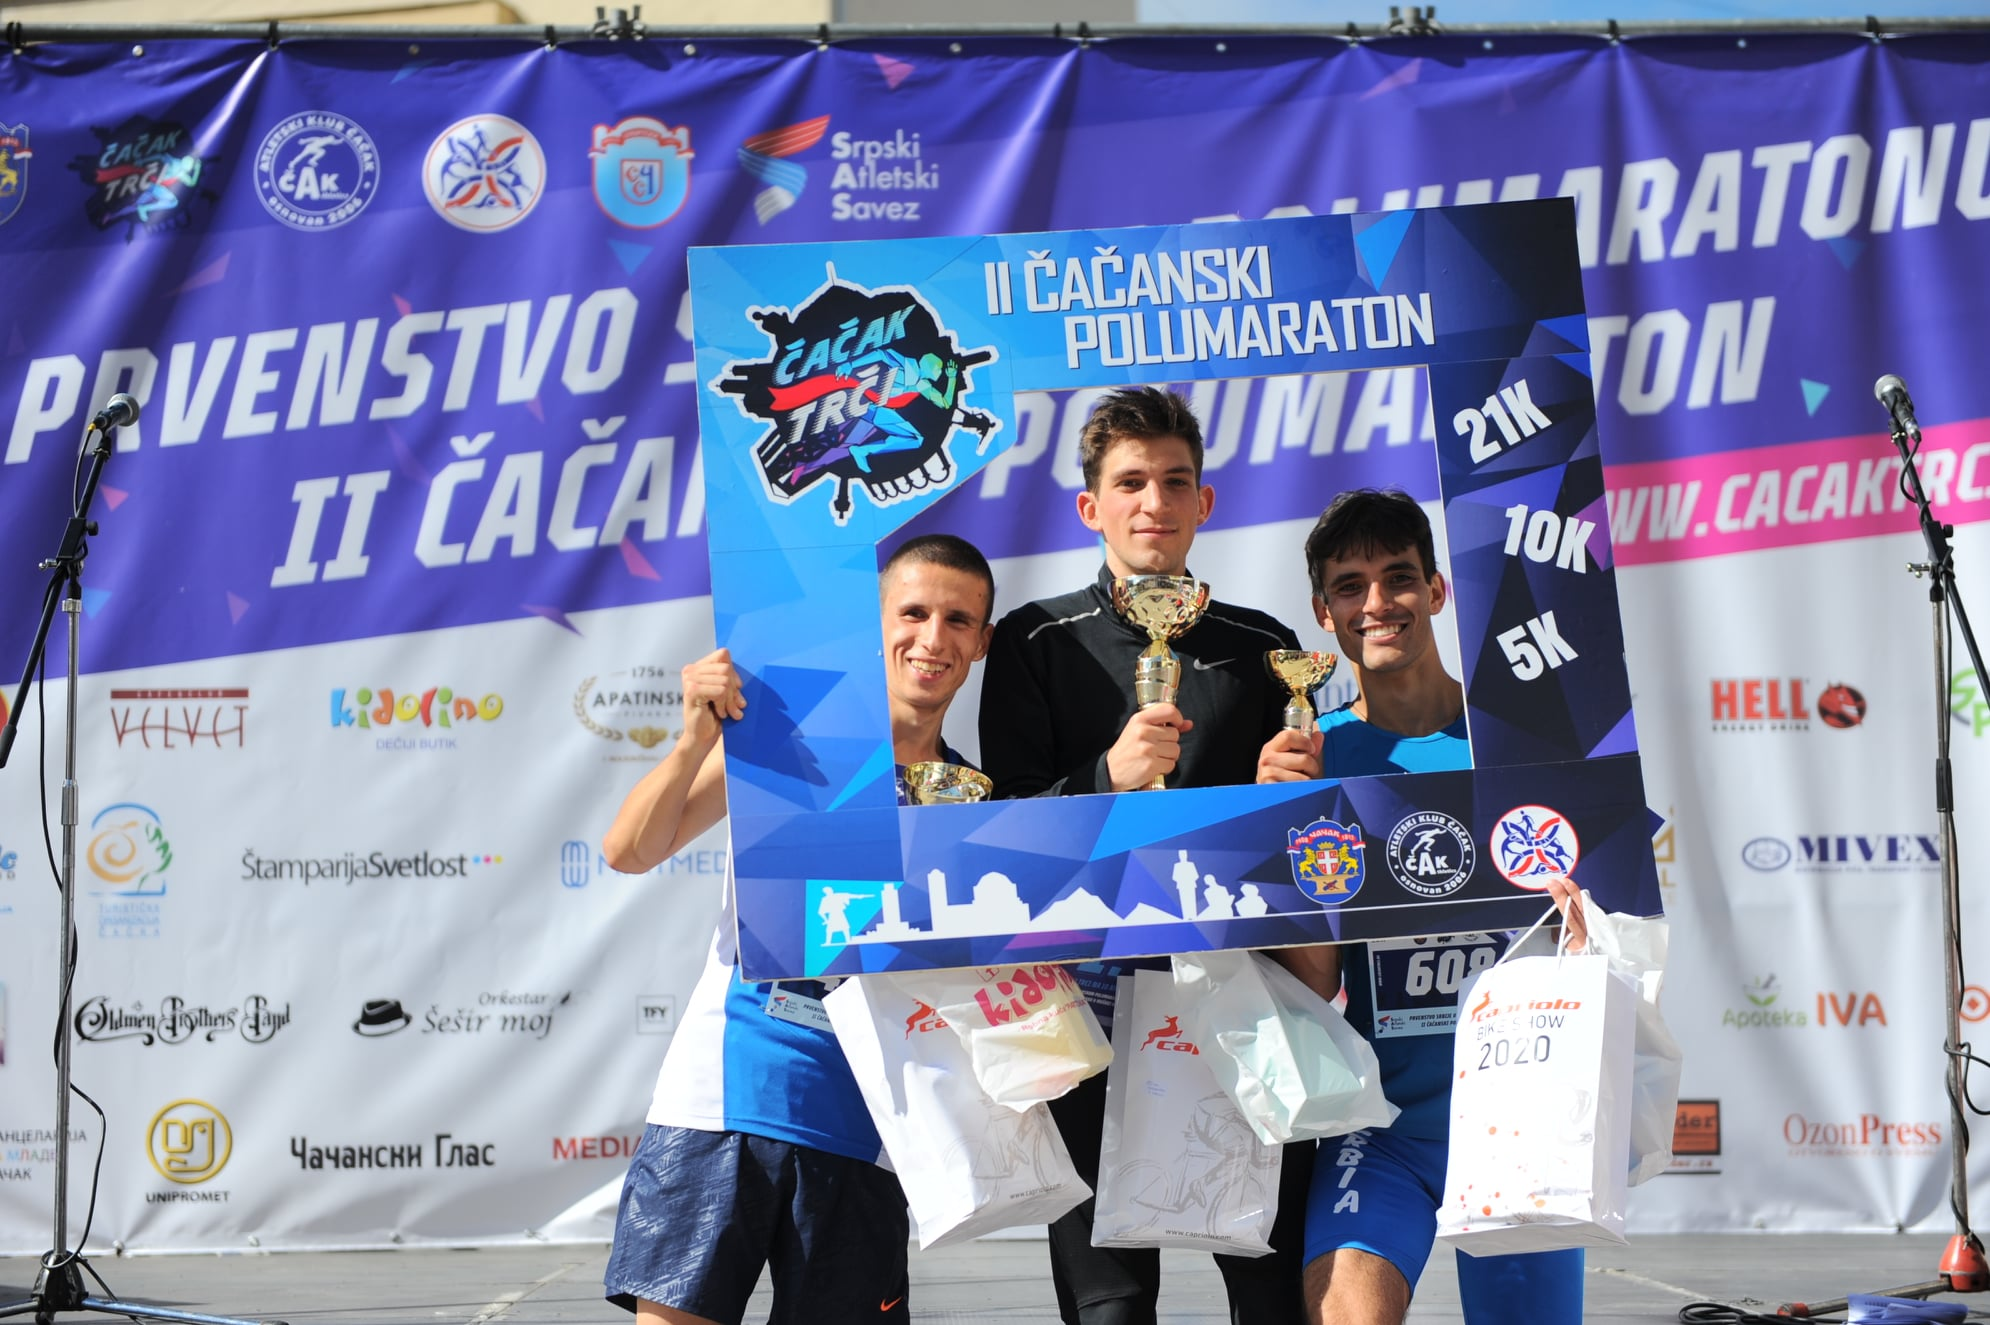 Čačanski polumaraton 2020, pobednici trke na 10km